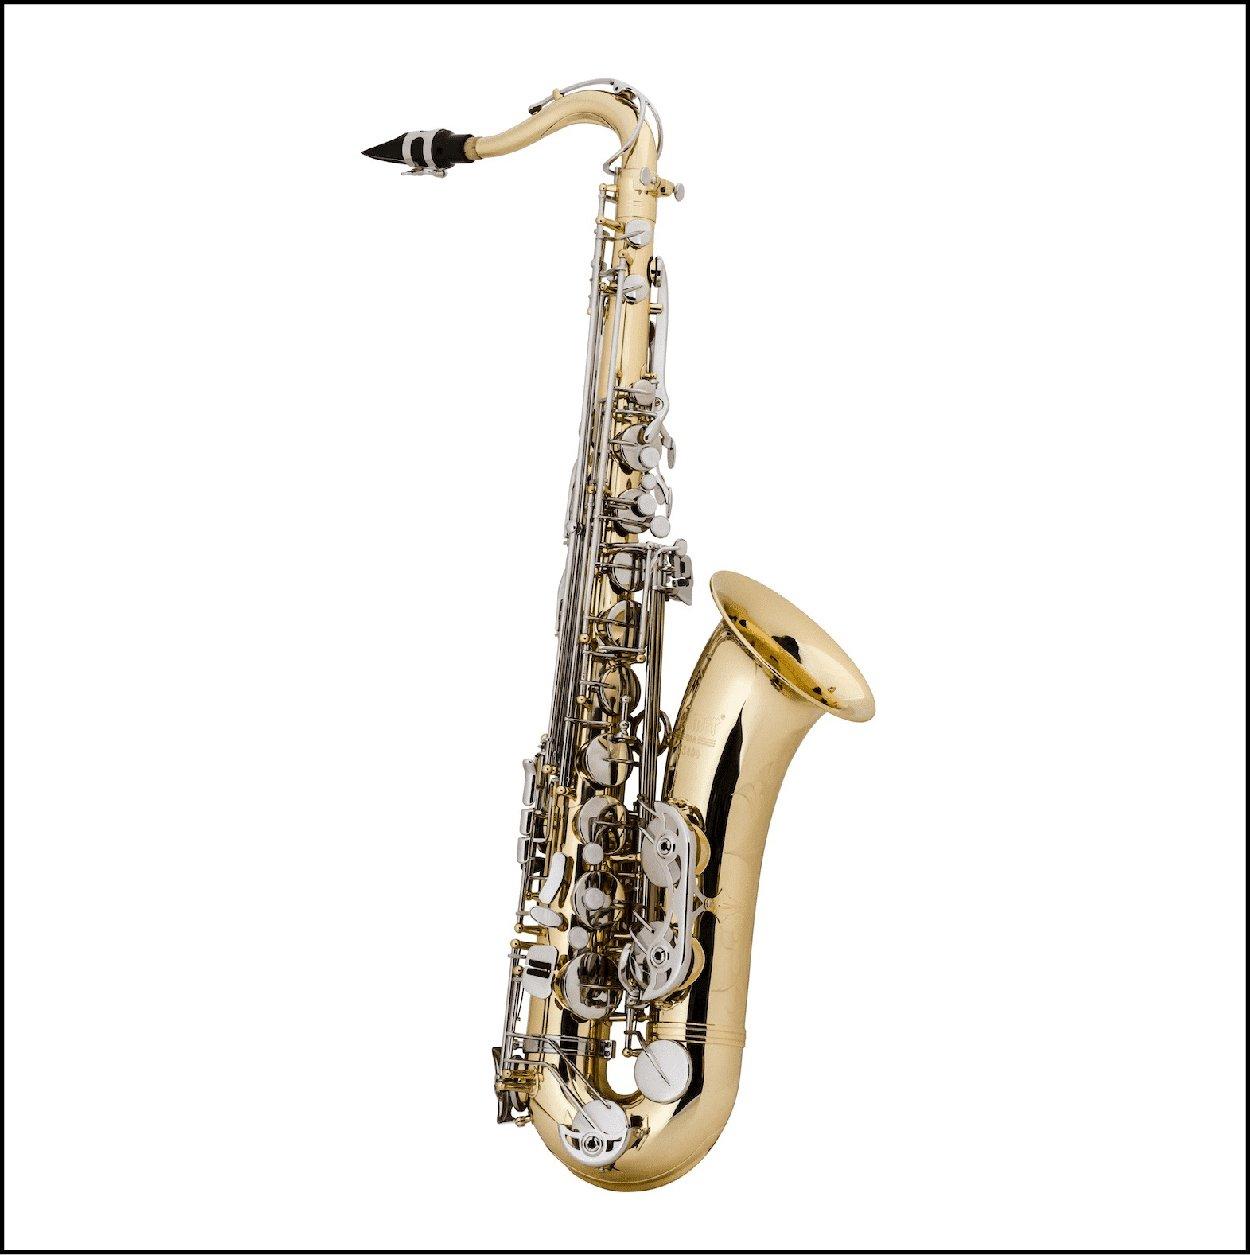 Selmer TS400 Tenor Saxophone - New